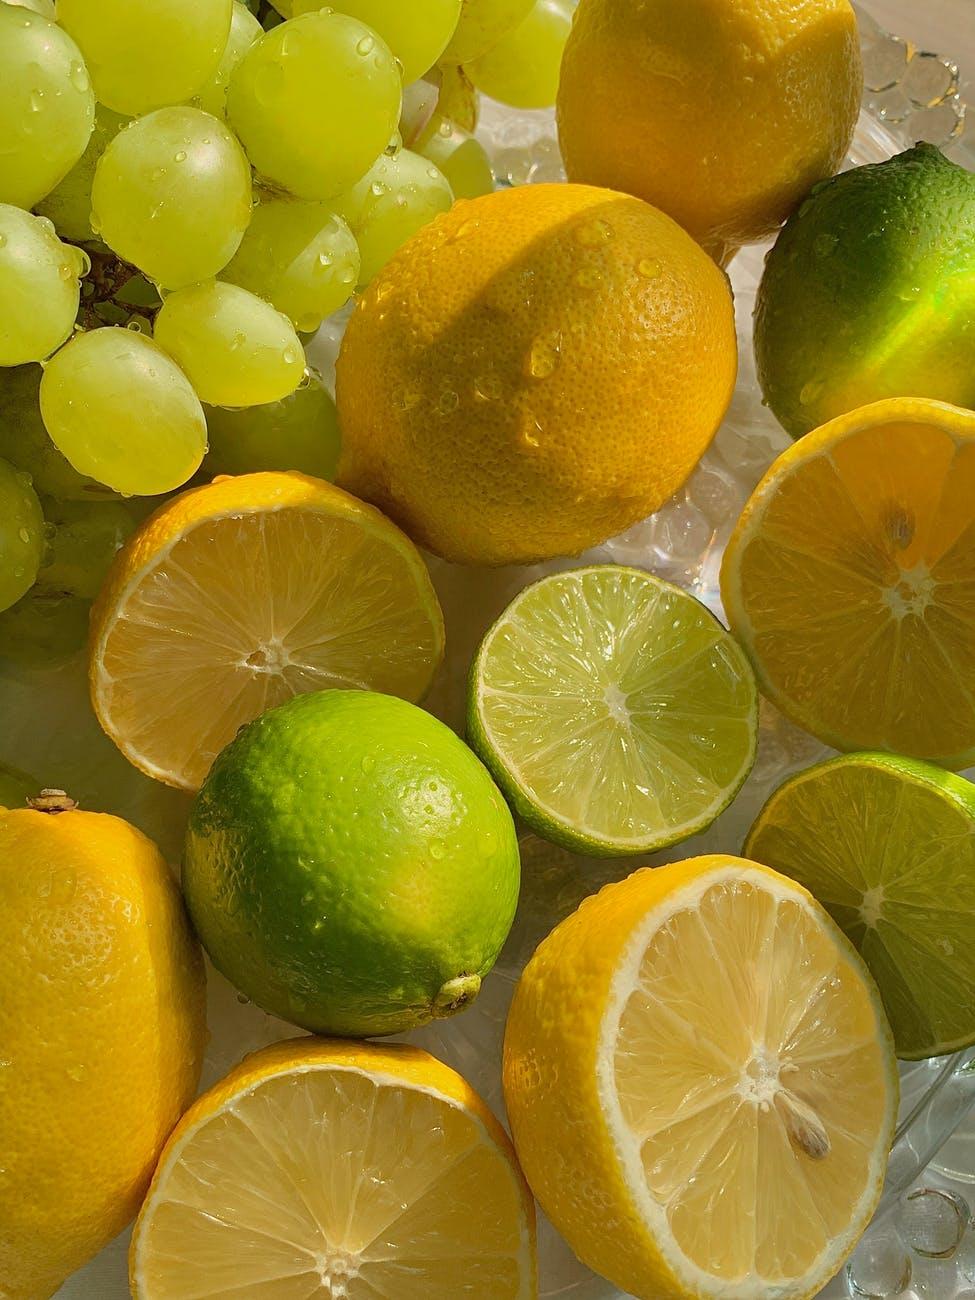 a close up shot of tropical fruits